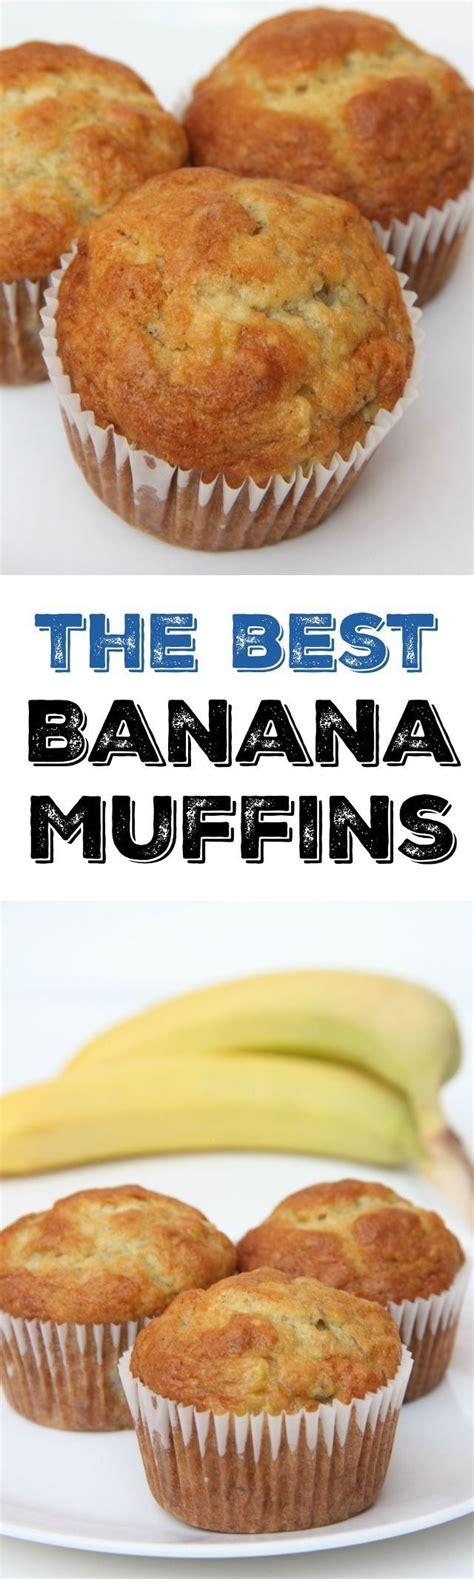 best banana muffins the best banana muffins great banana flavor moist and